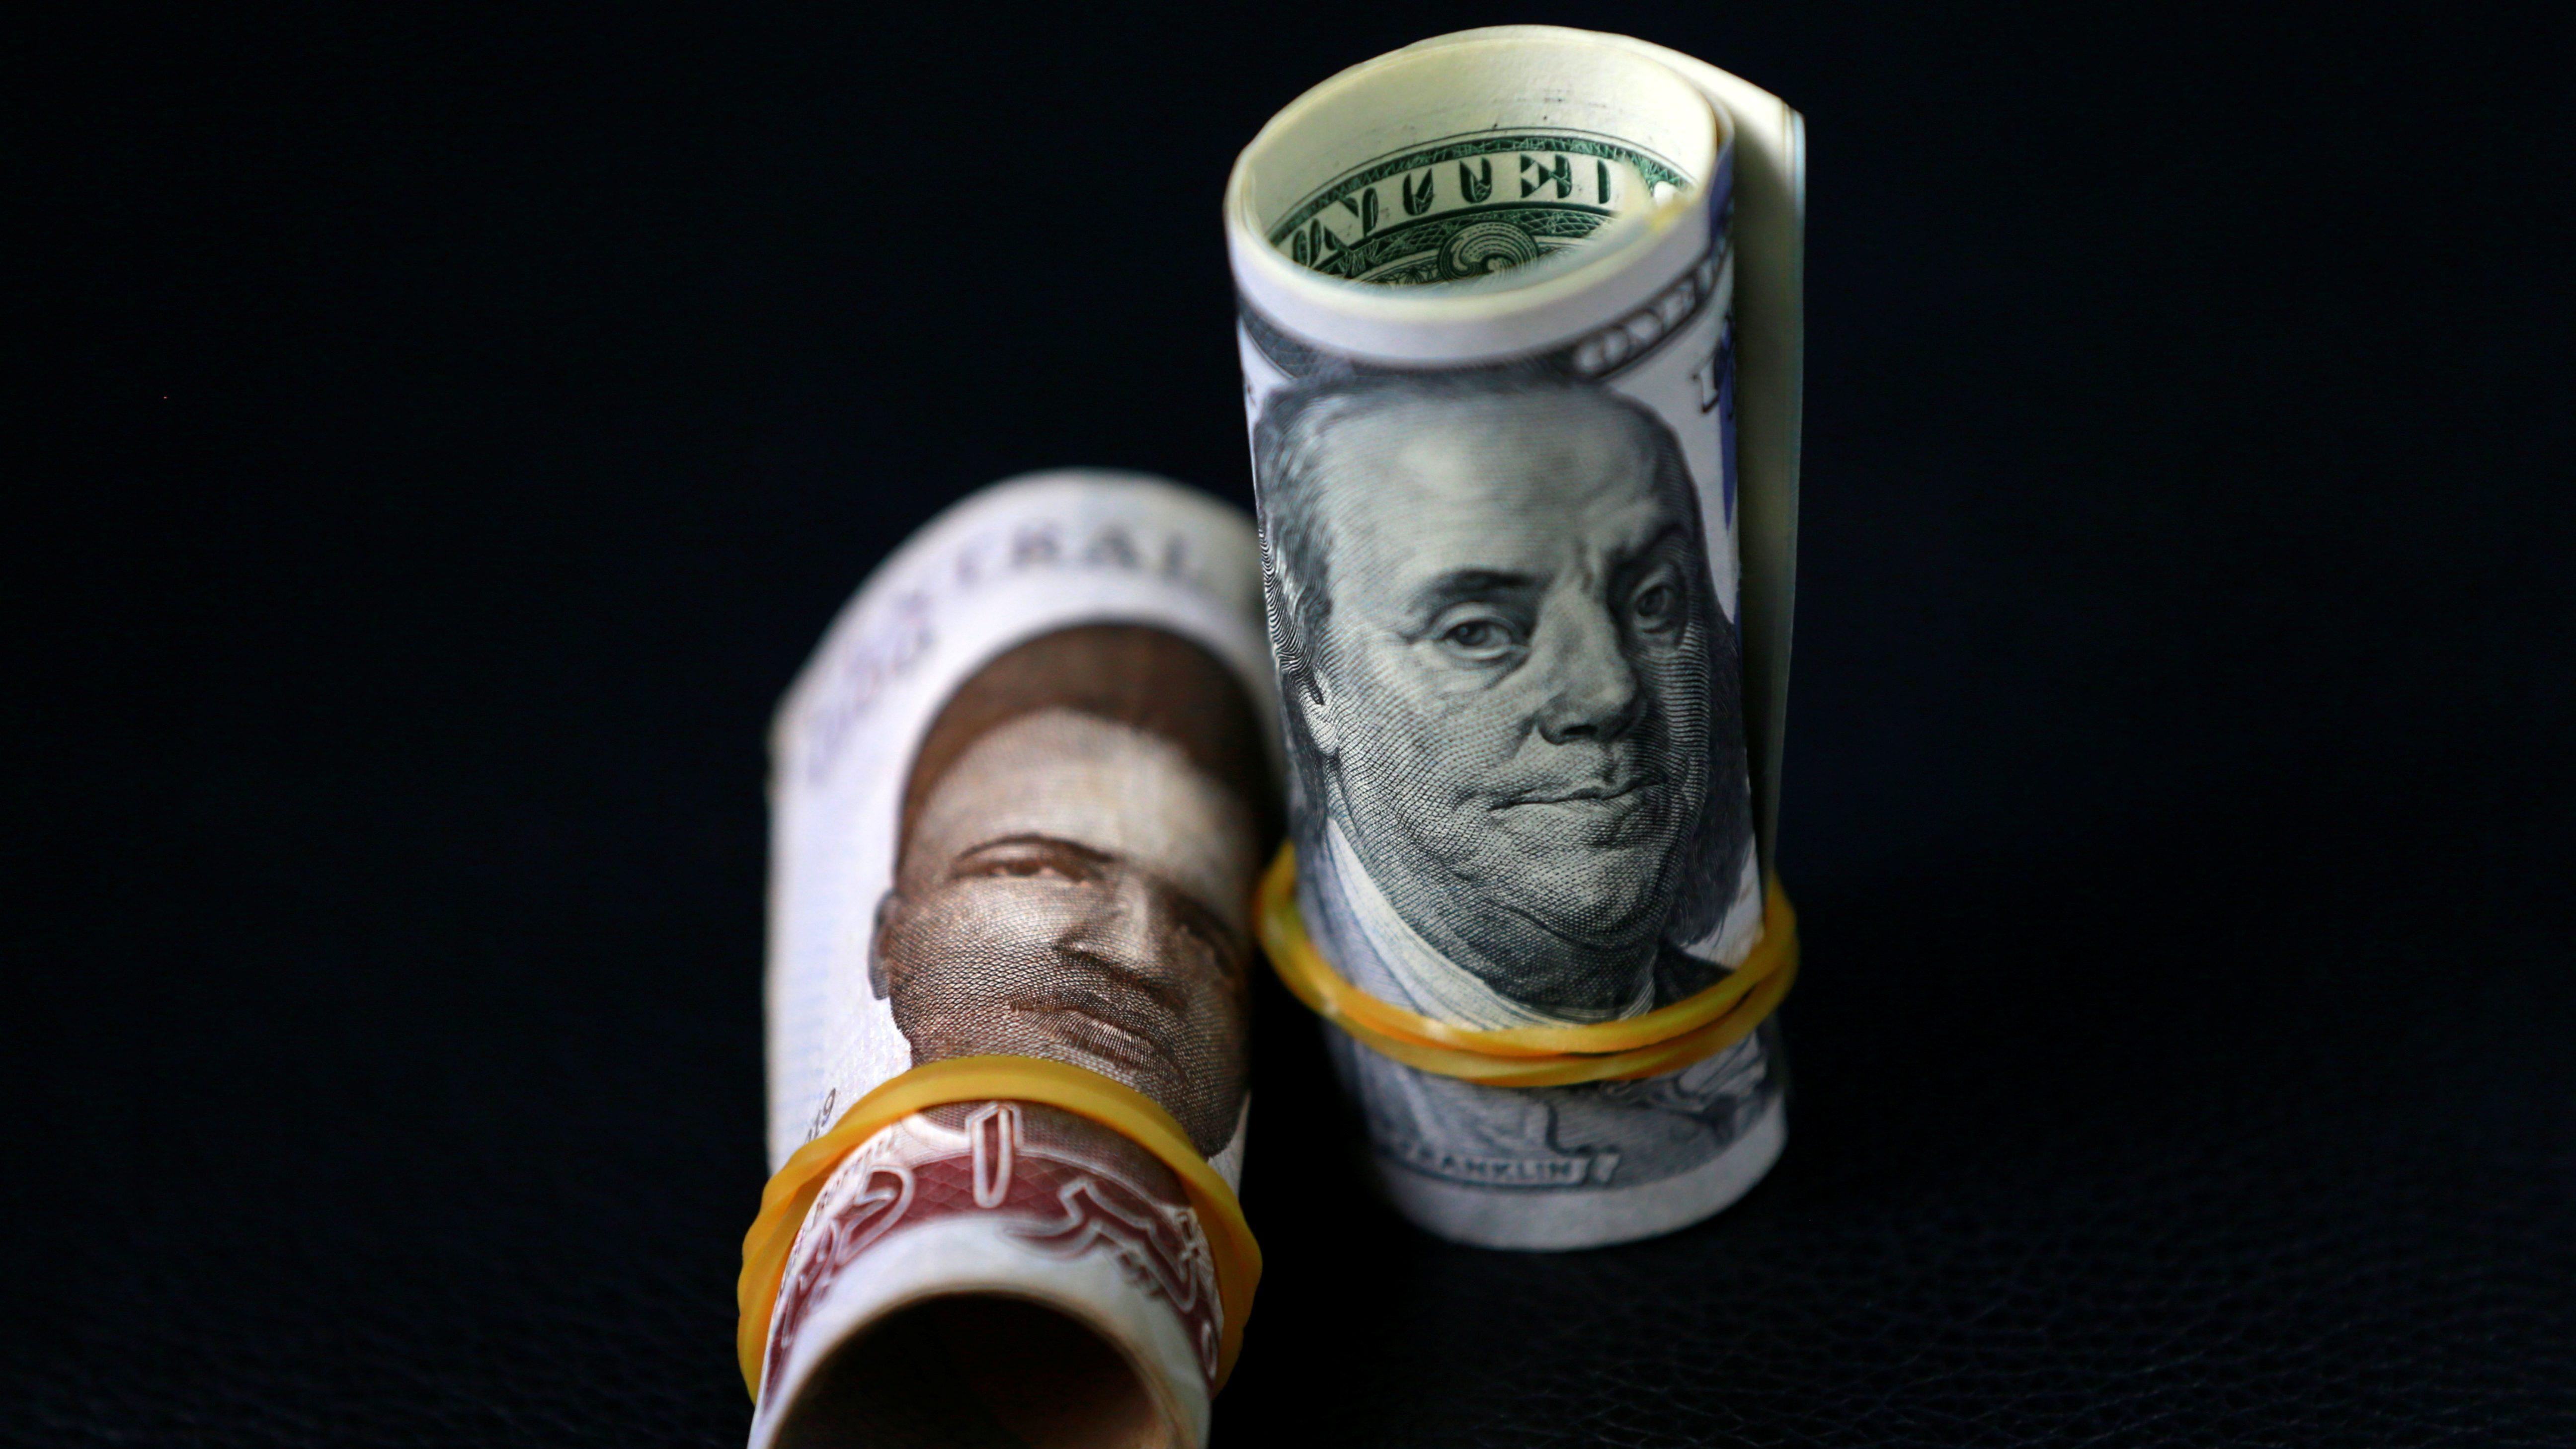 A Nigerian naira and an American dollar banknote.